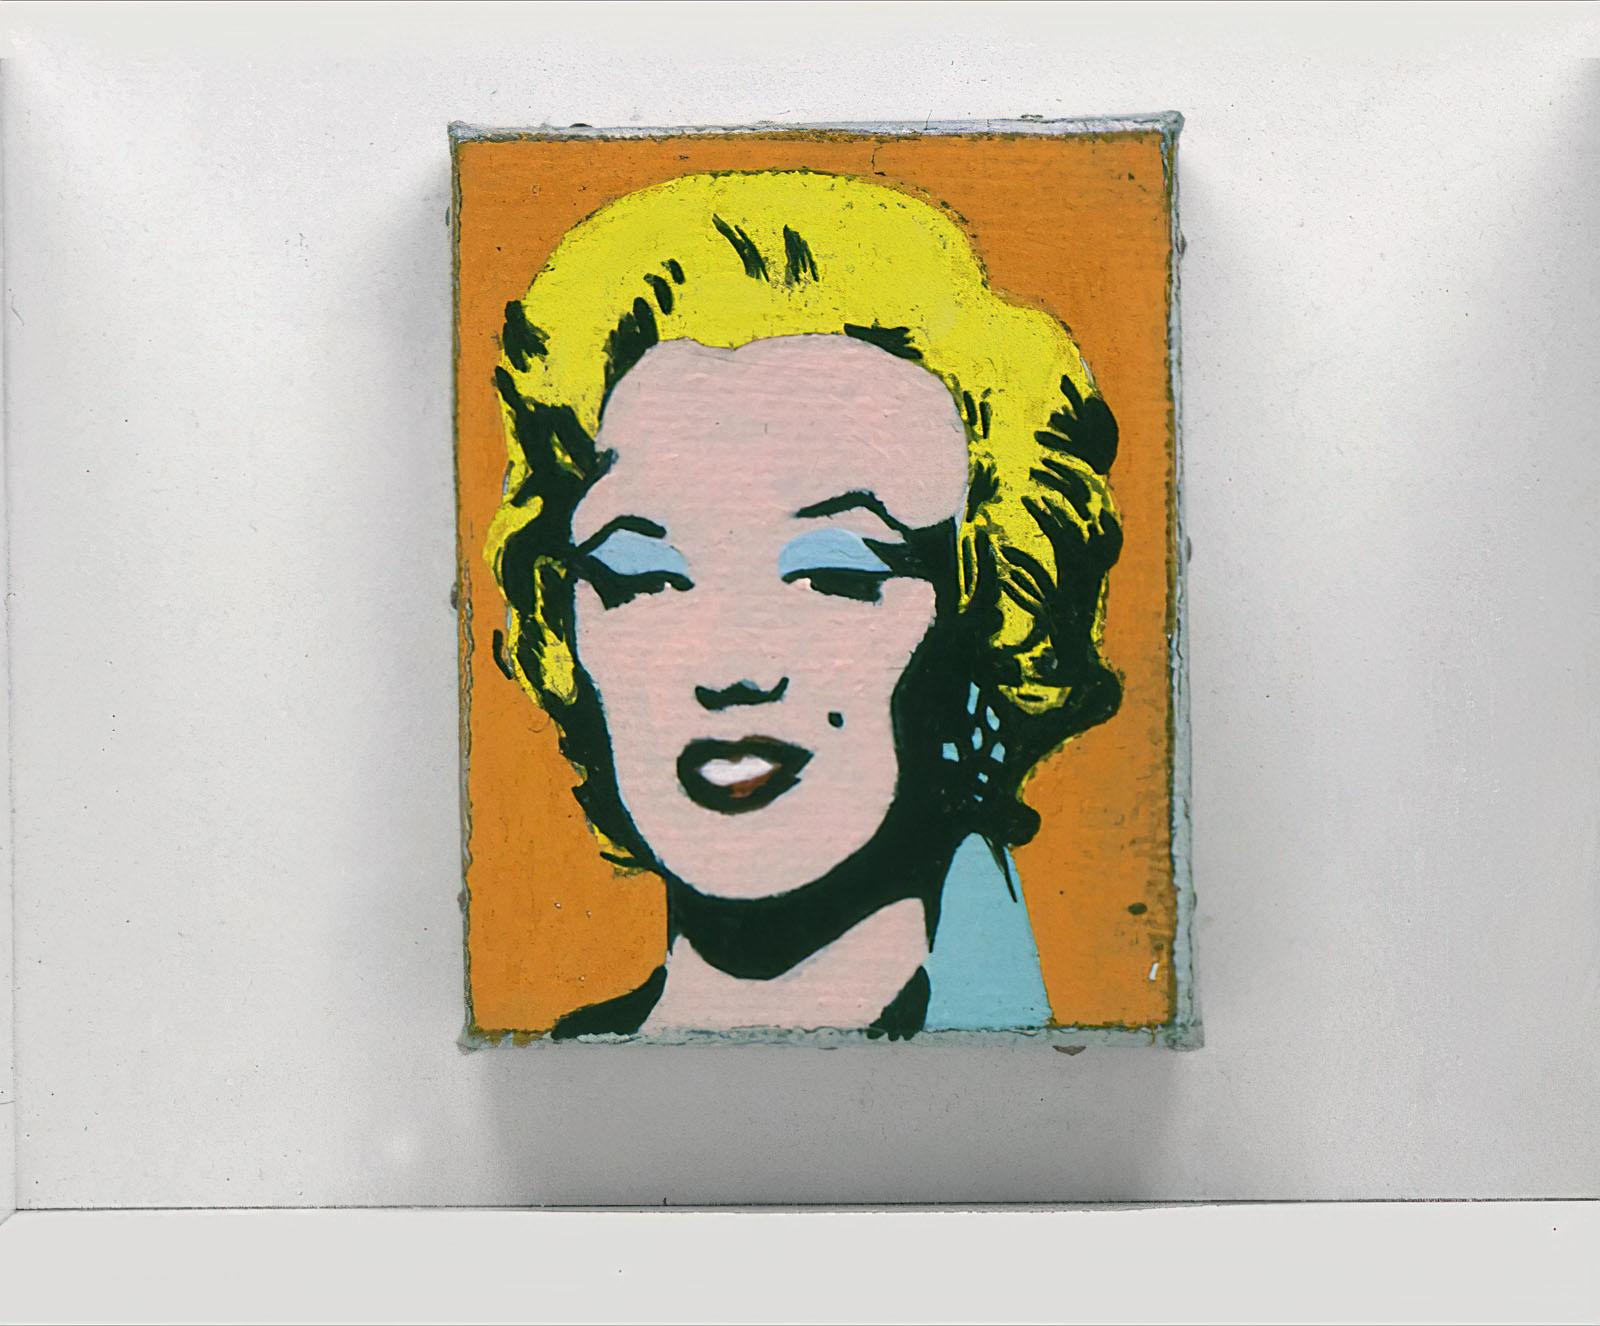 Andy Warhol / Richard Pettibone - Marilyn Monroe